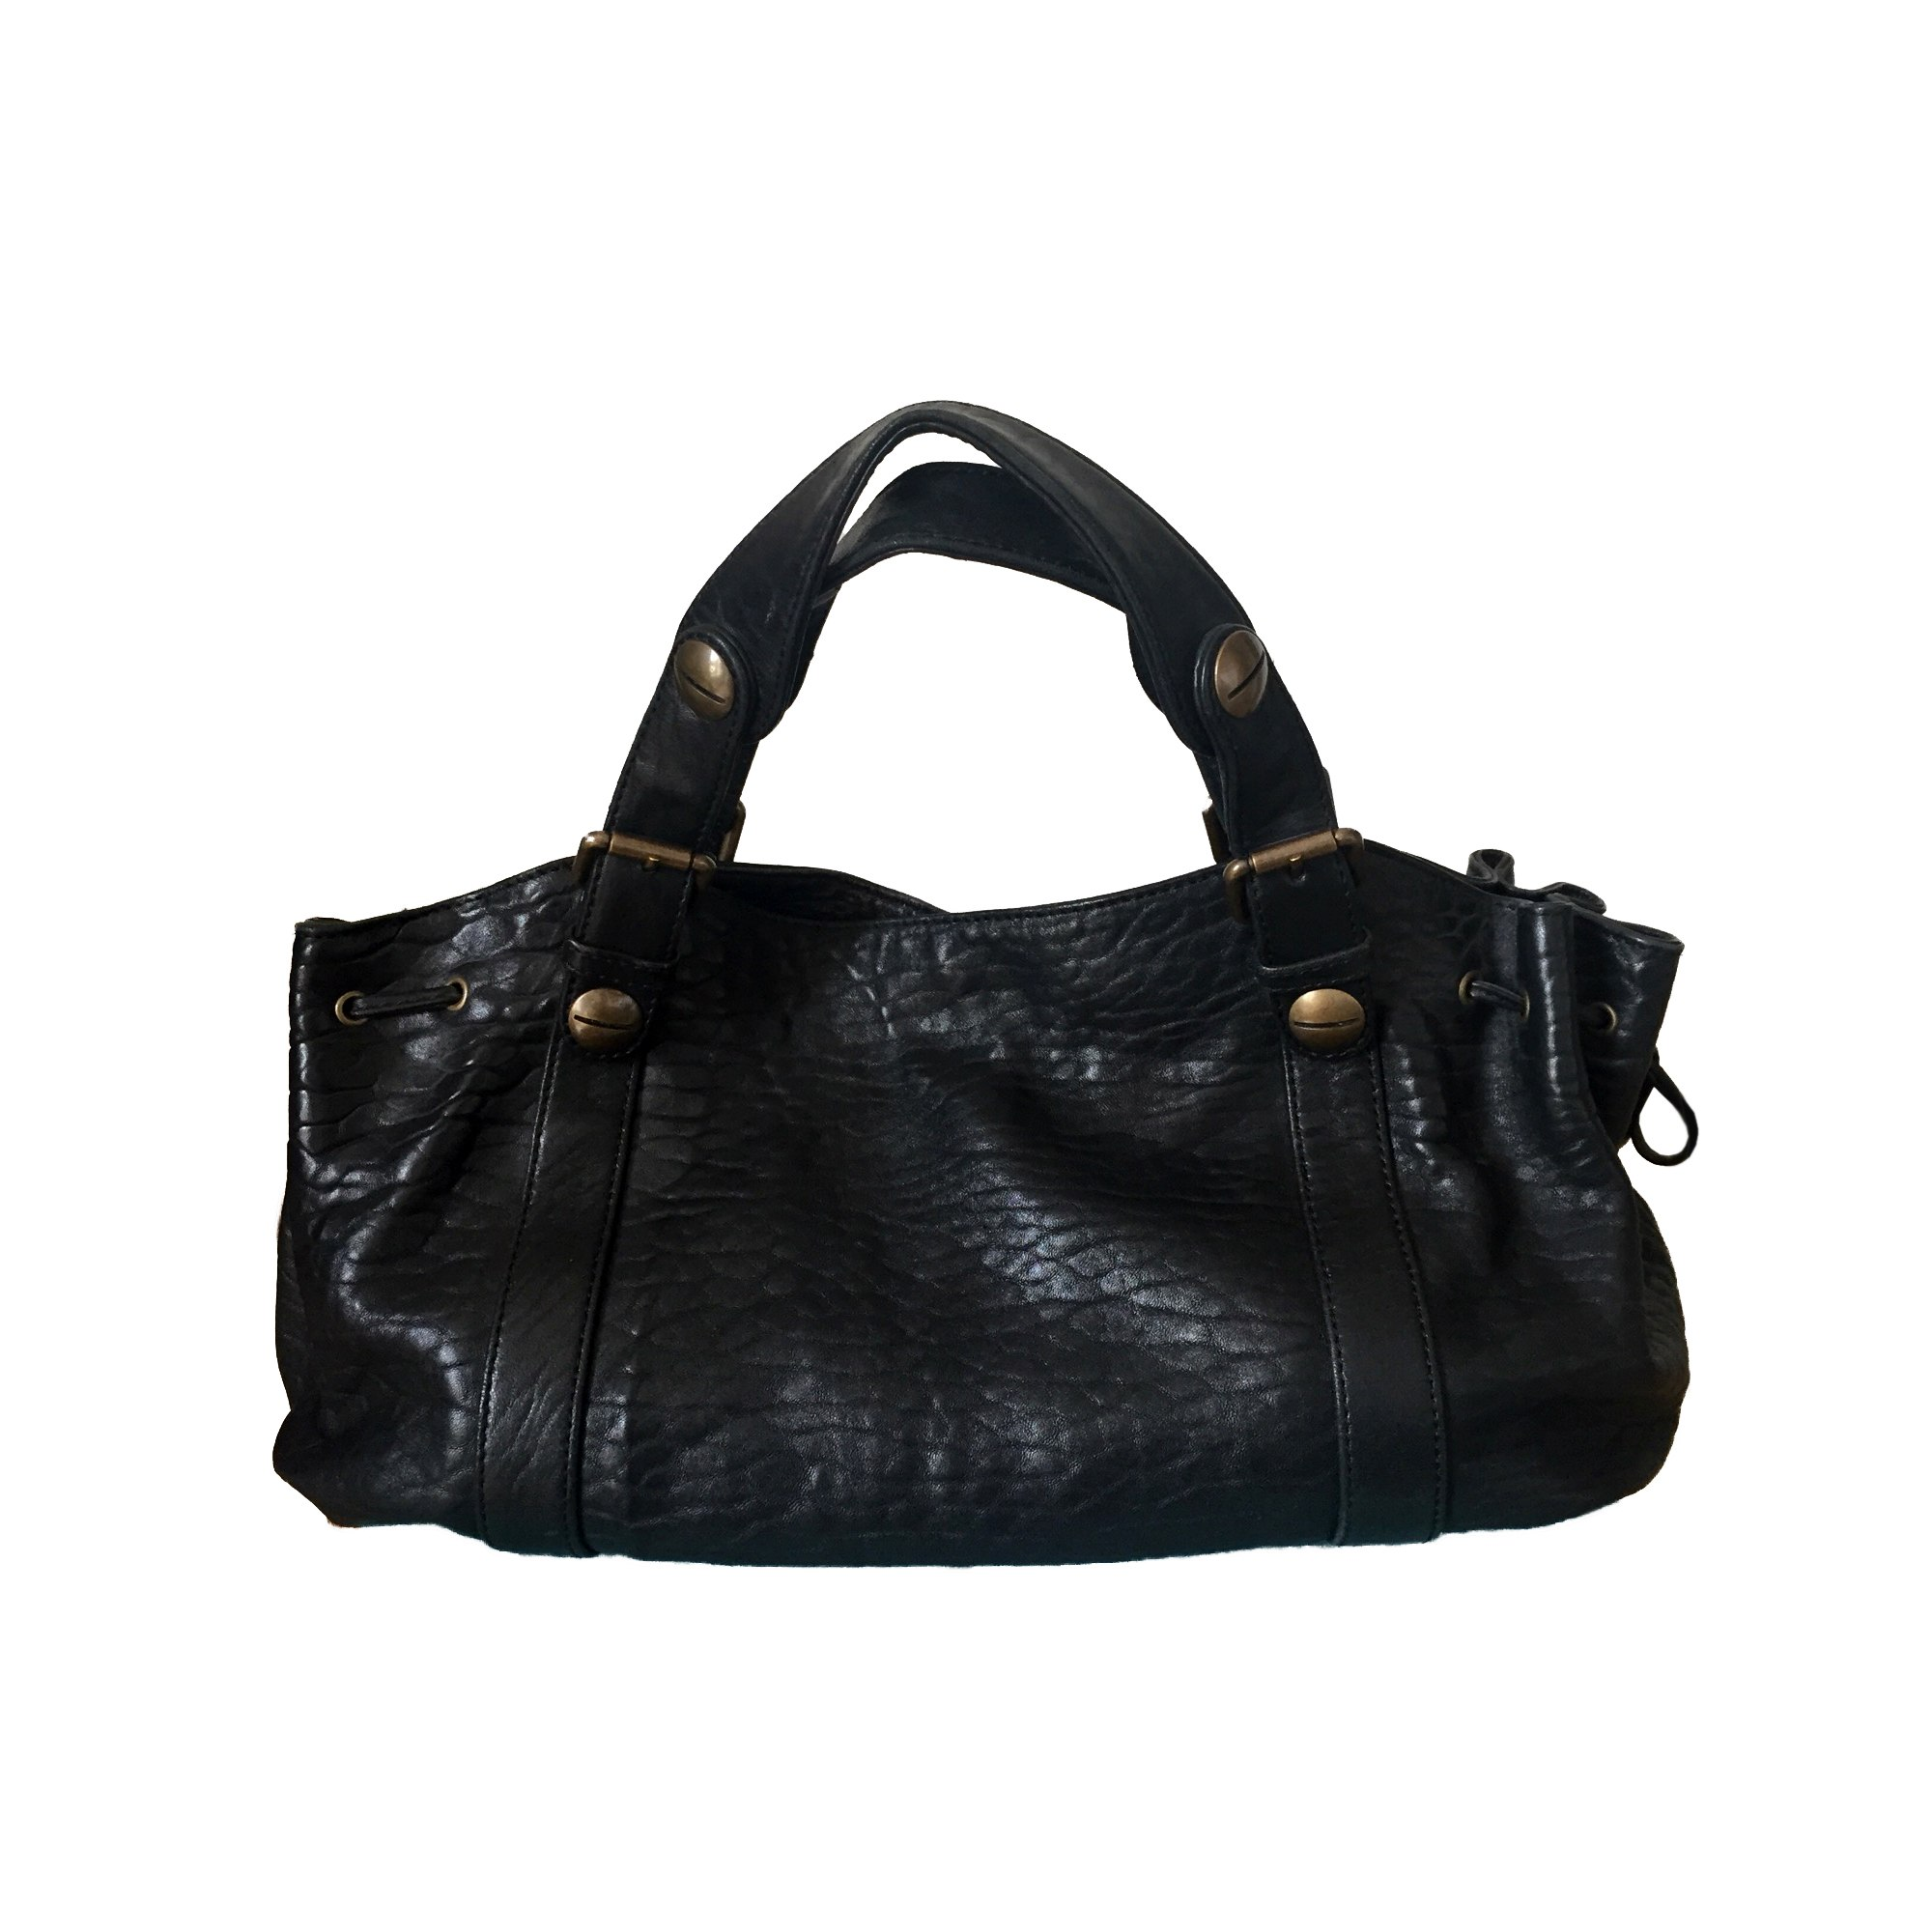 00b1fab3b0a7 Sac à main en cuir GERARD DAREL noir vendu par Séverine 87176320 ...